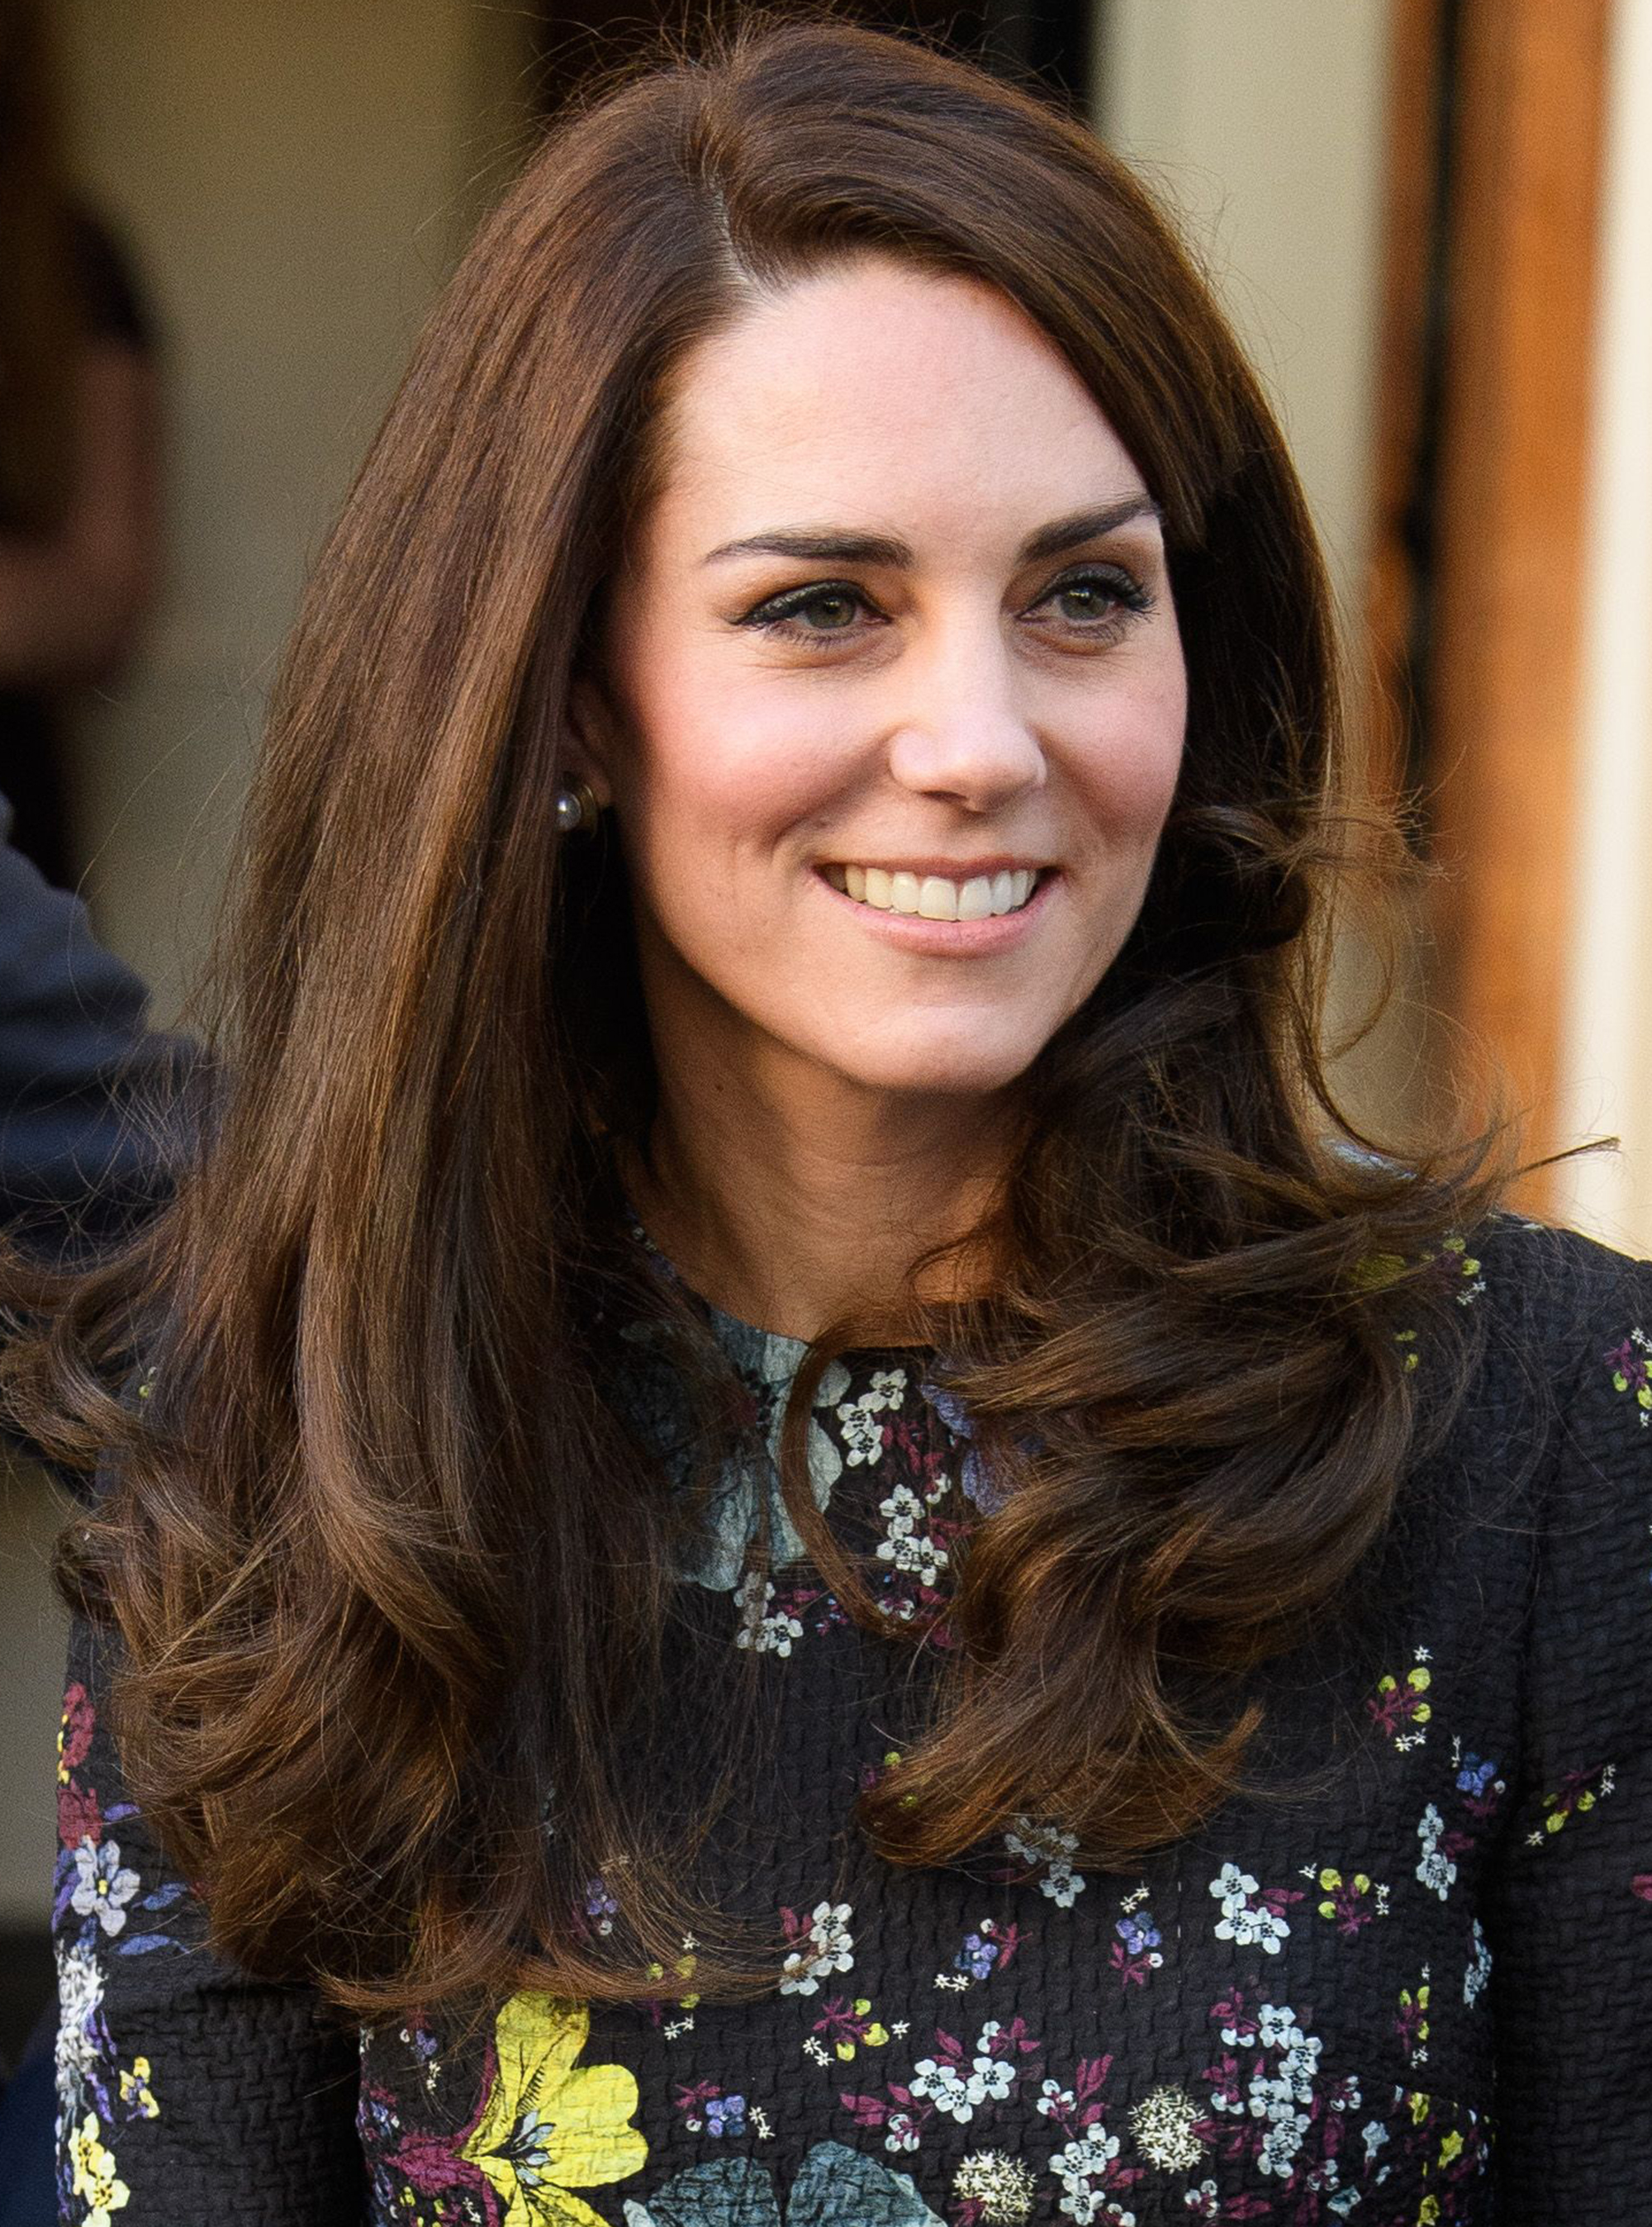 HRH The Duchess of Cambridge, Kate Middleton